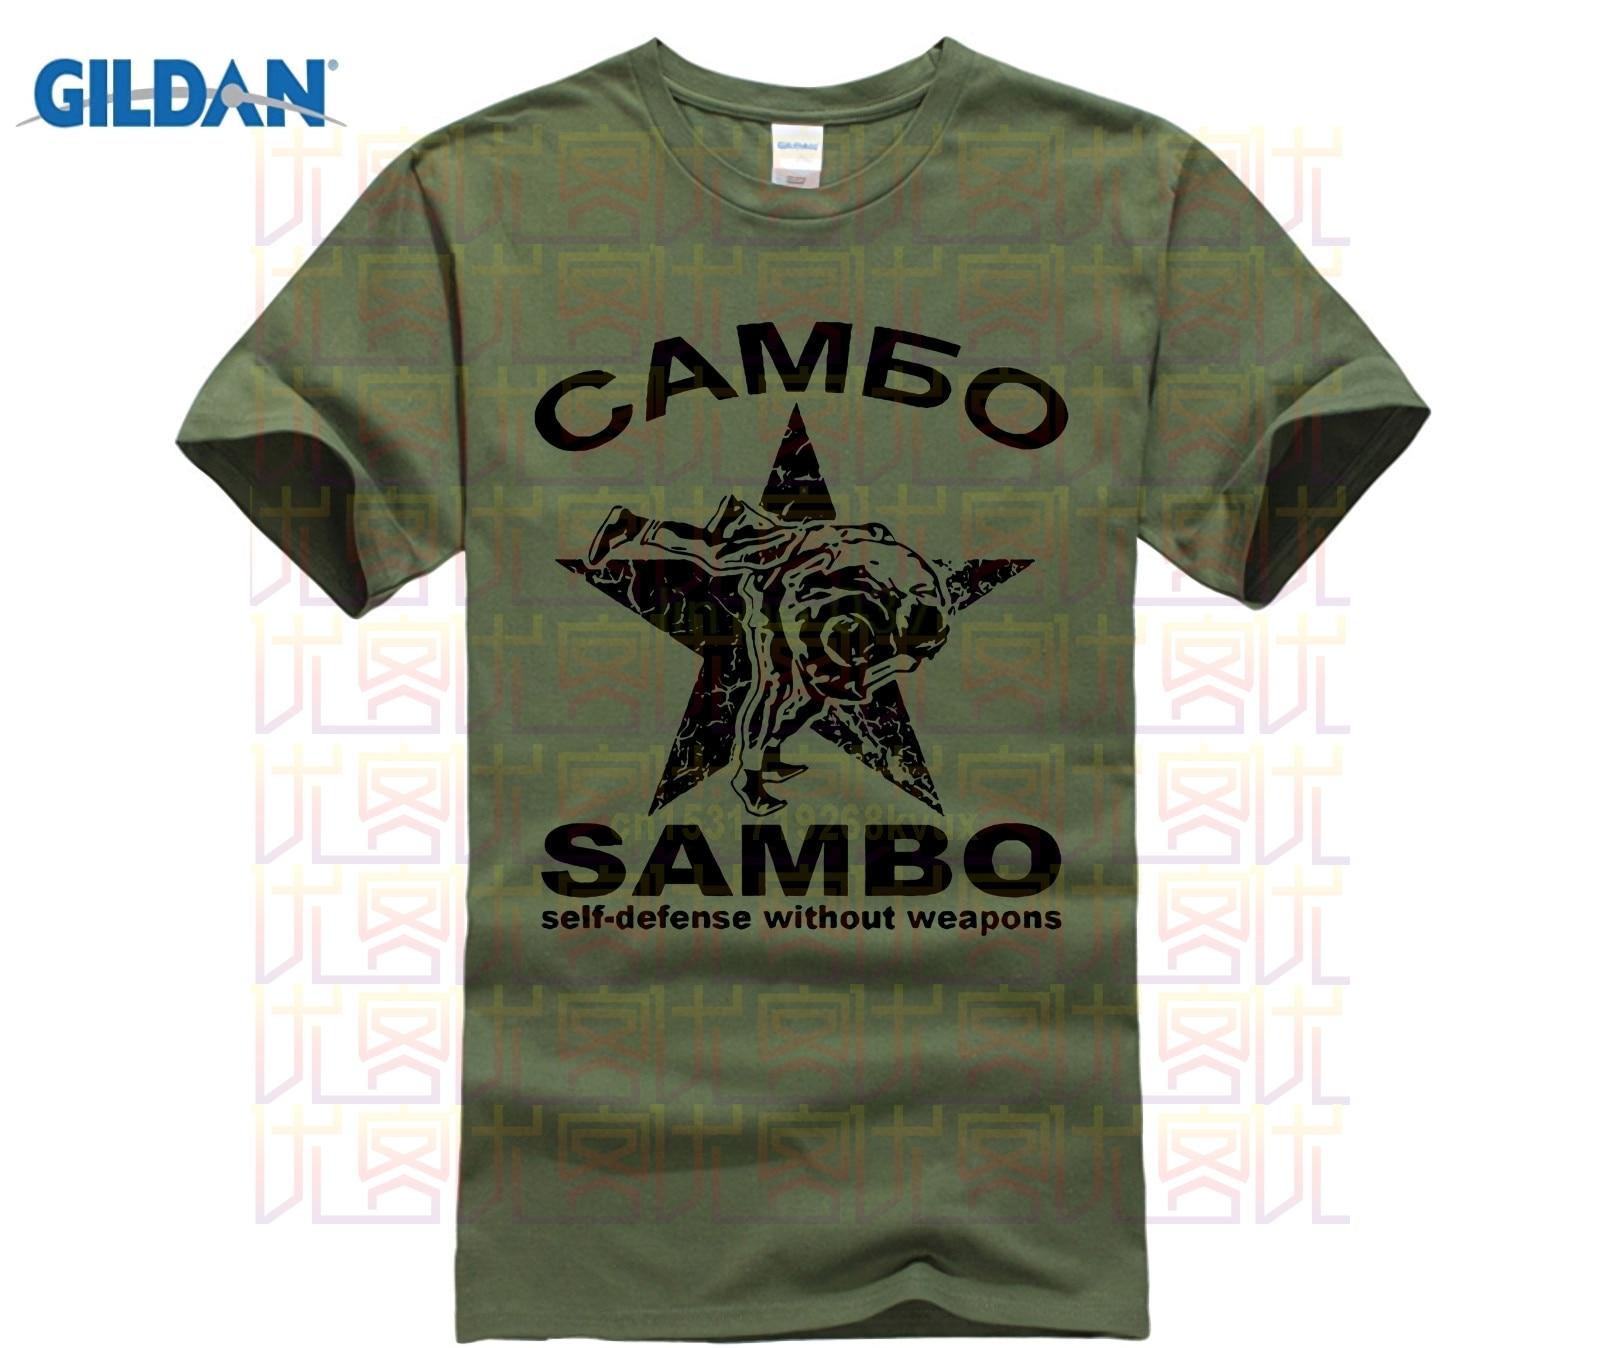 Moda gran oferta 100% algodón Sambo camuflaje defensa personal sin arma ruso kung fu ejército verde Camiseta camiseta